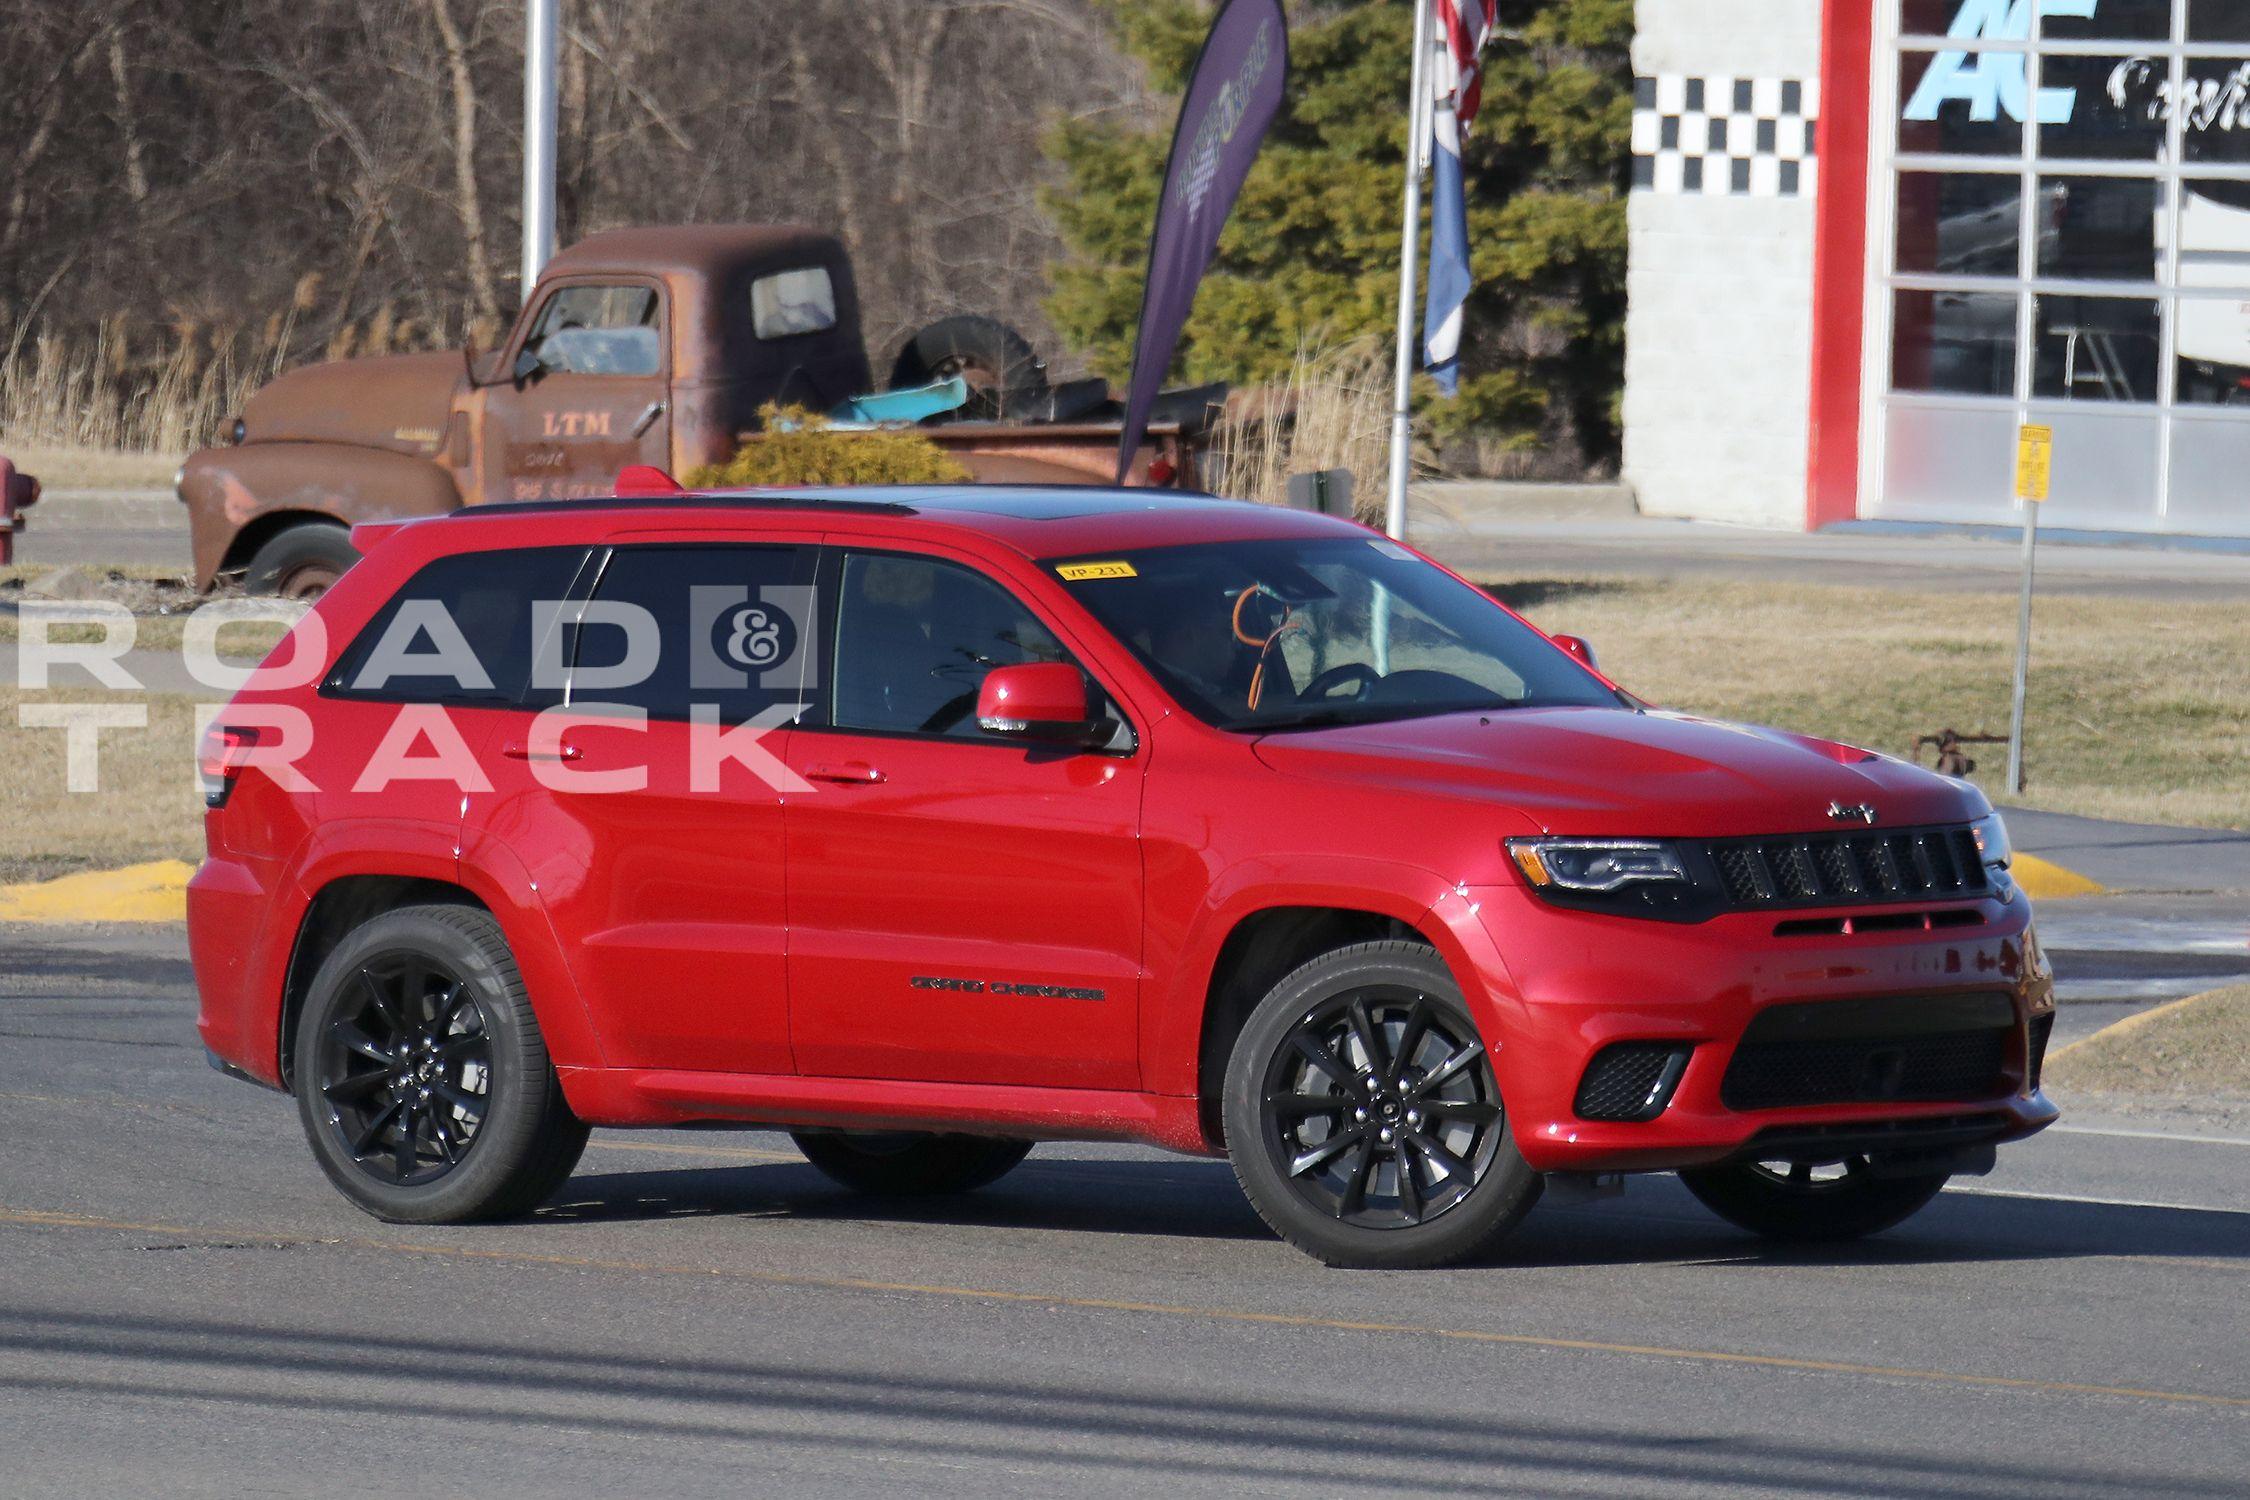 Jeep Grand Cherokee Hellcat Jeep SRT Trackhawk ing to New York